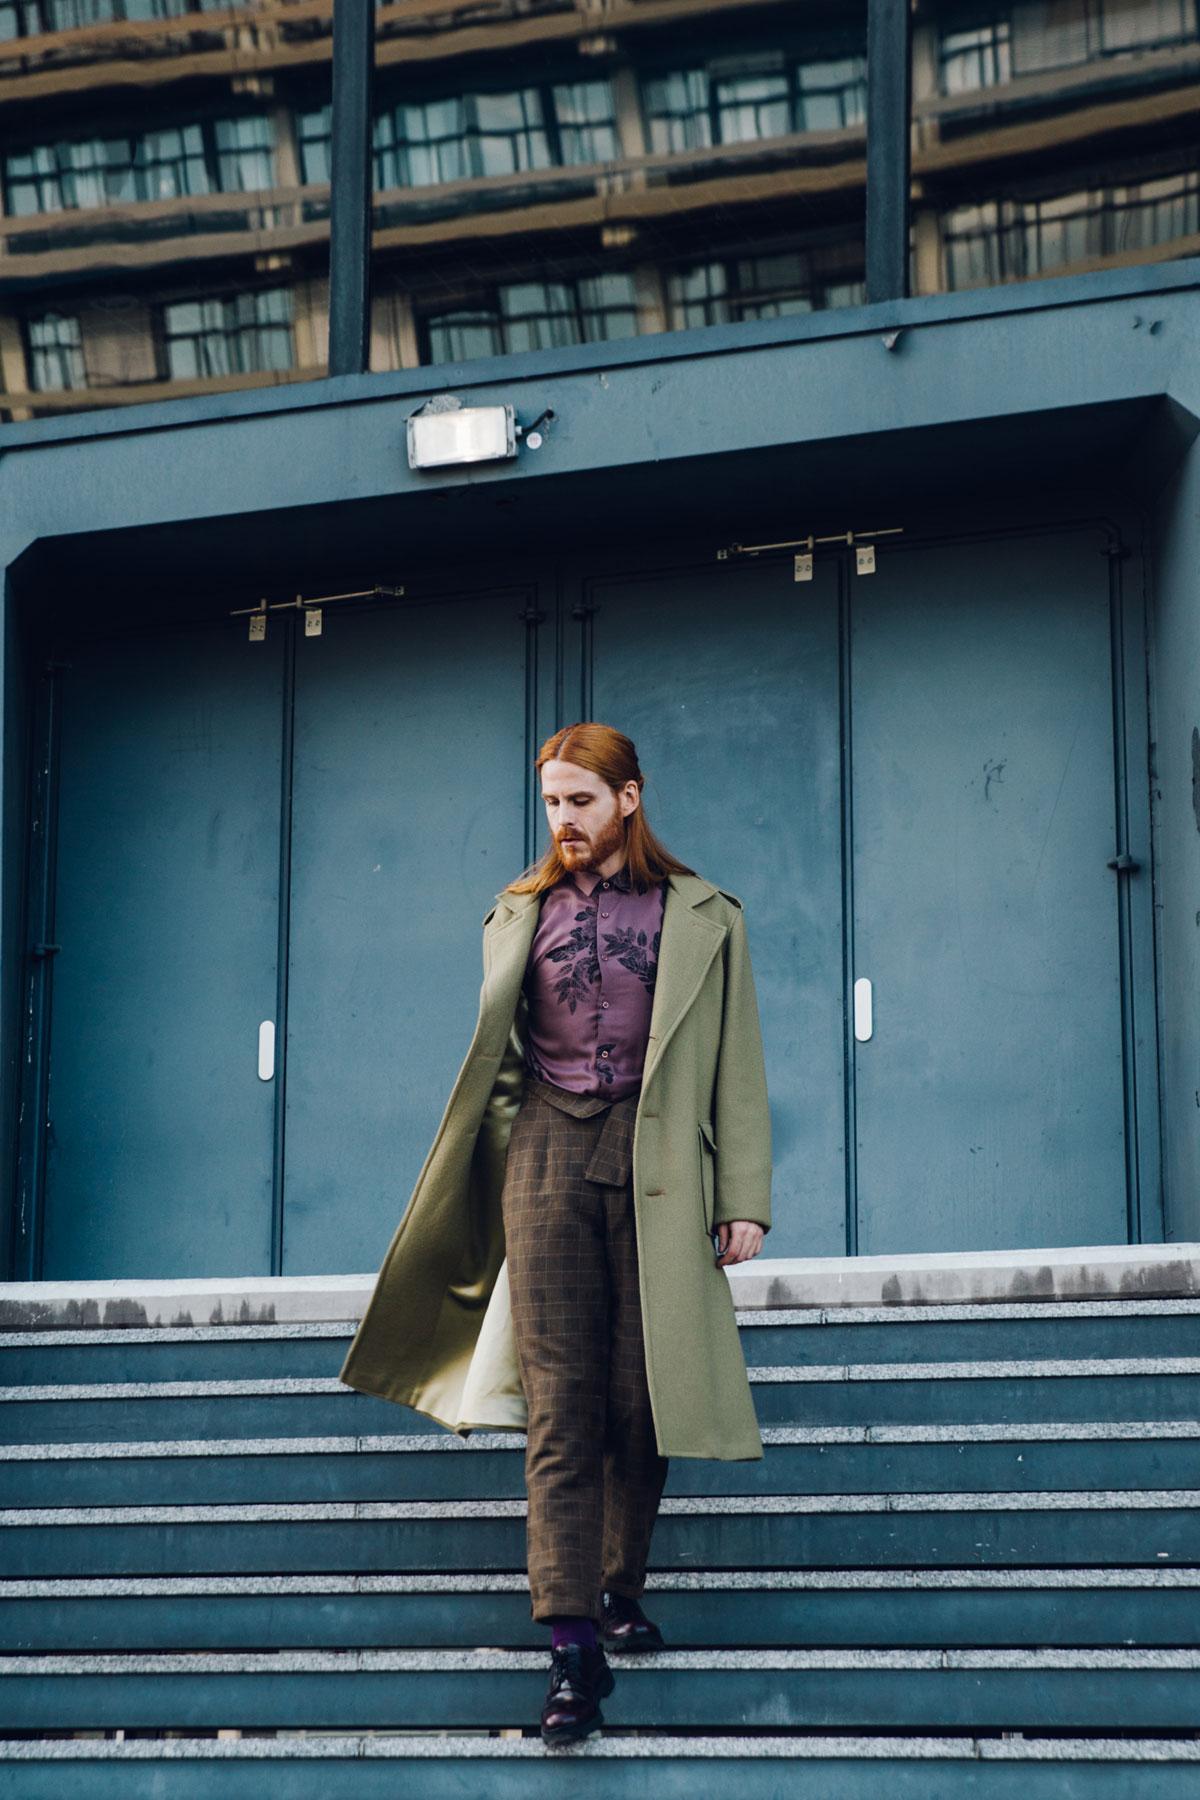 Stella-Lavinia-Berlin-Maennermode-Vintage-Mantel-Uniform